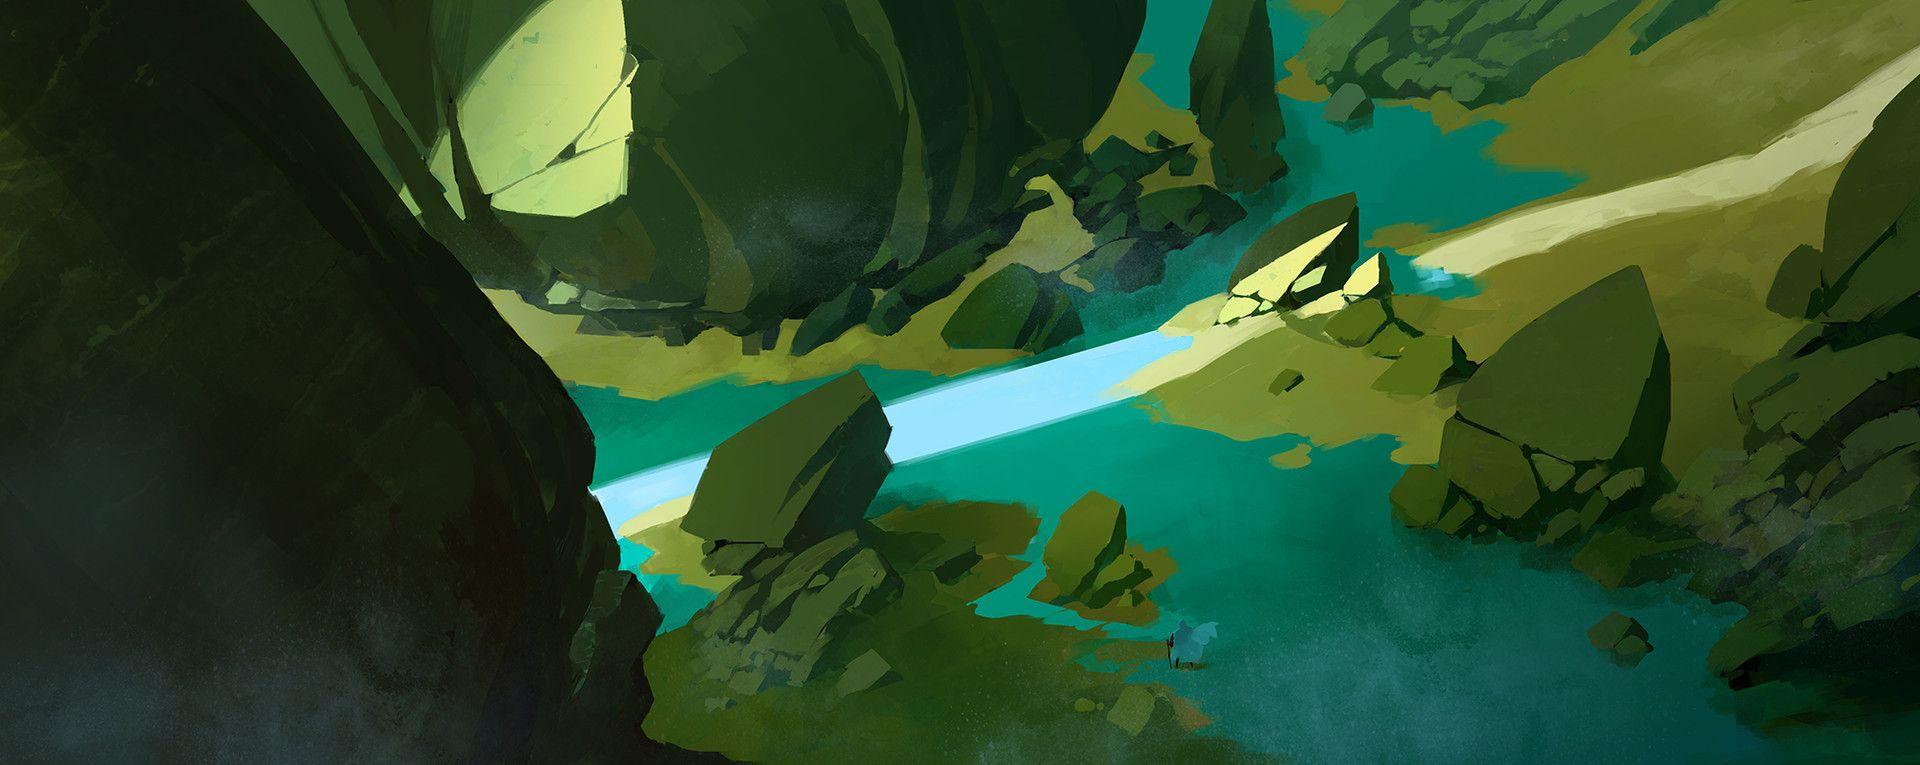 ArtStation - 蓝色湖边, YU YIMING